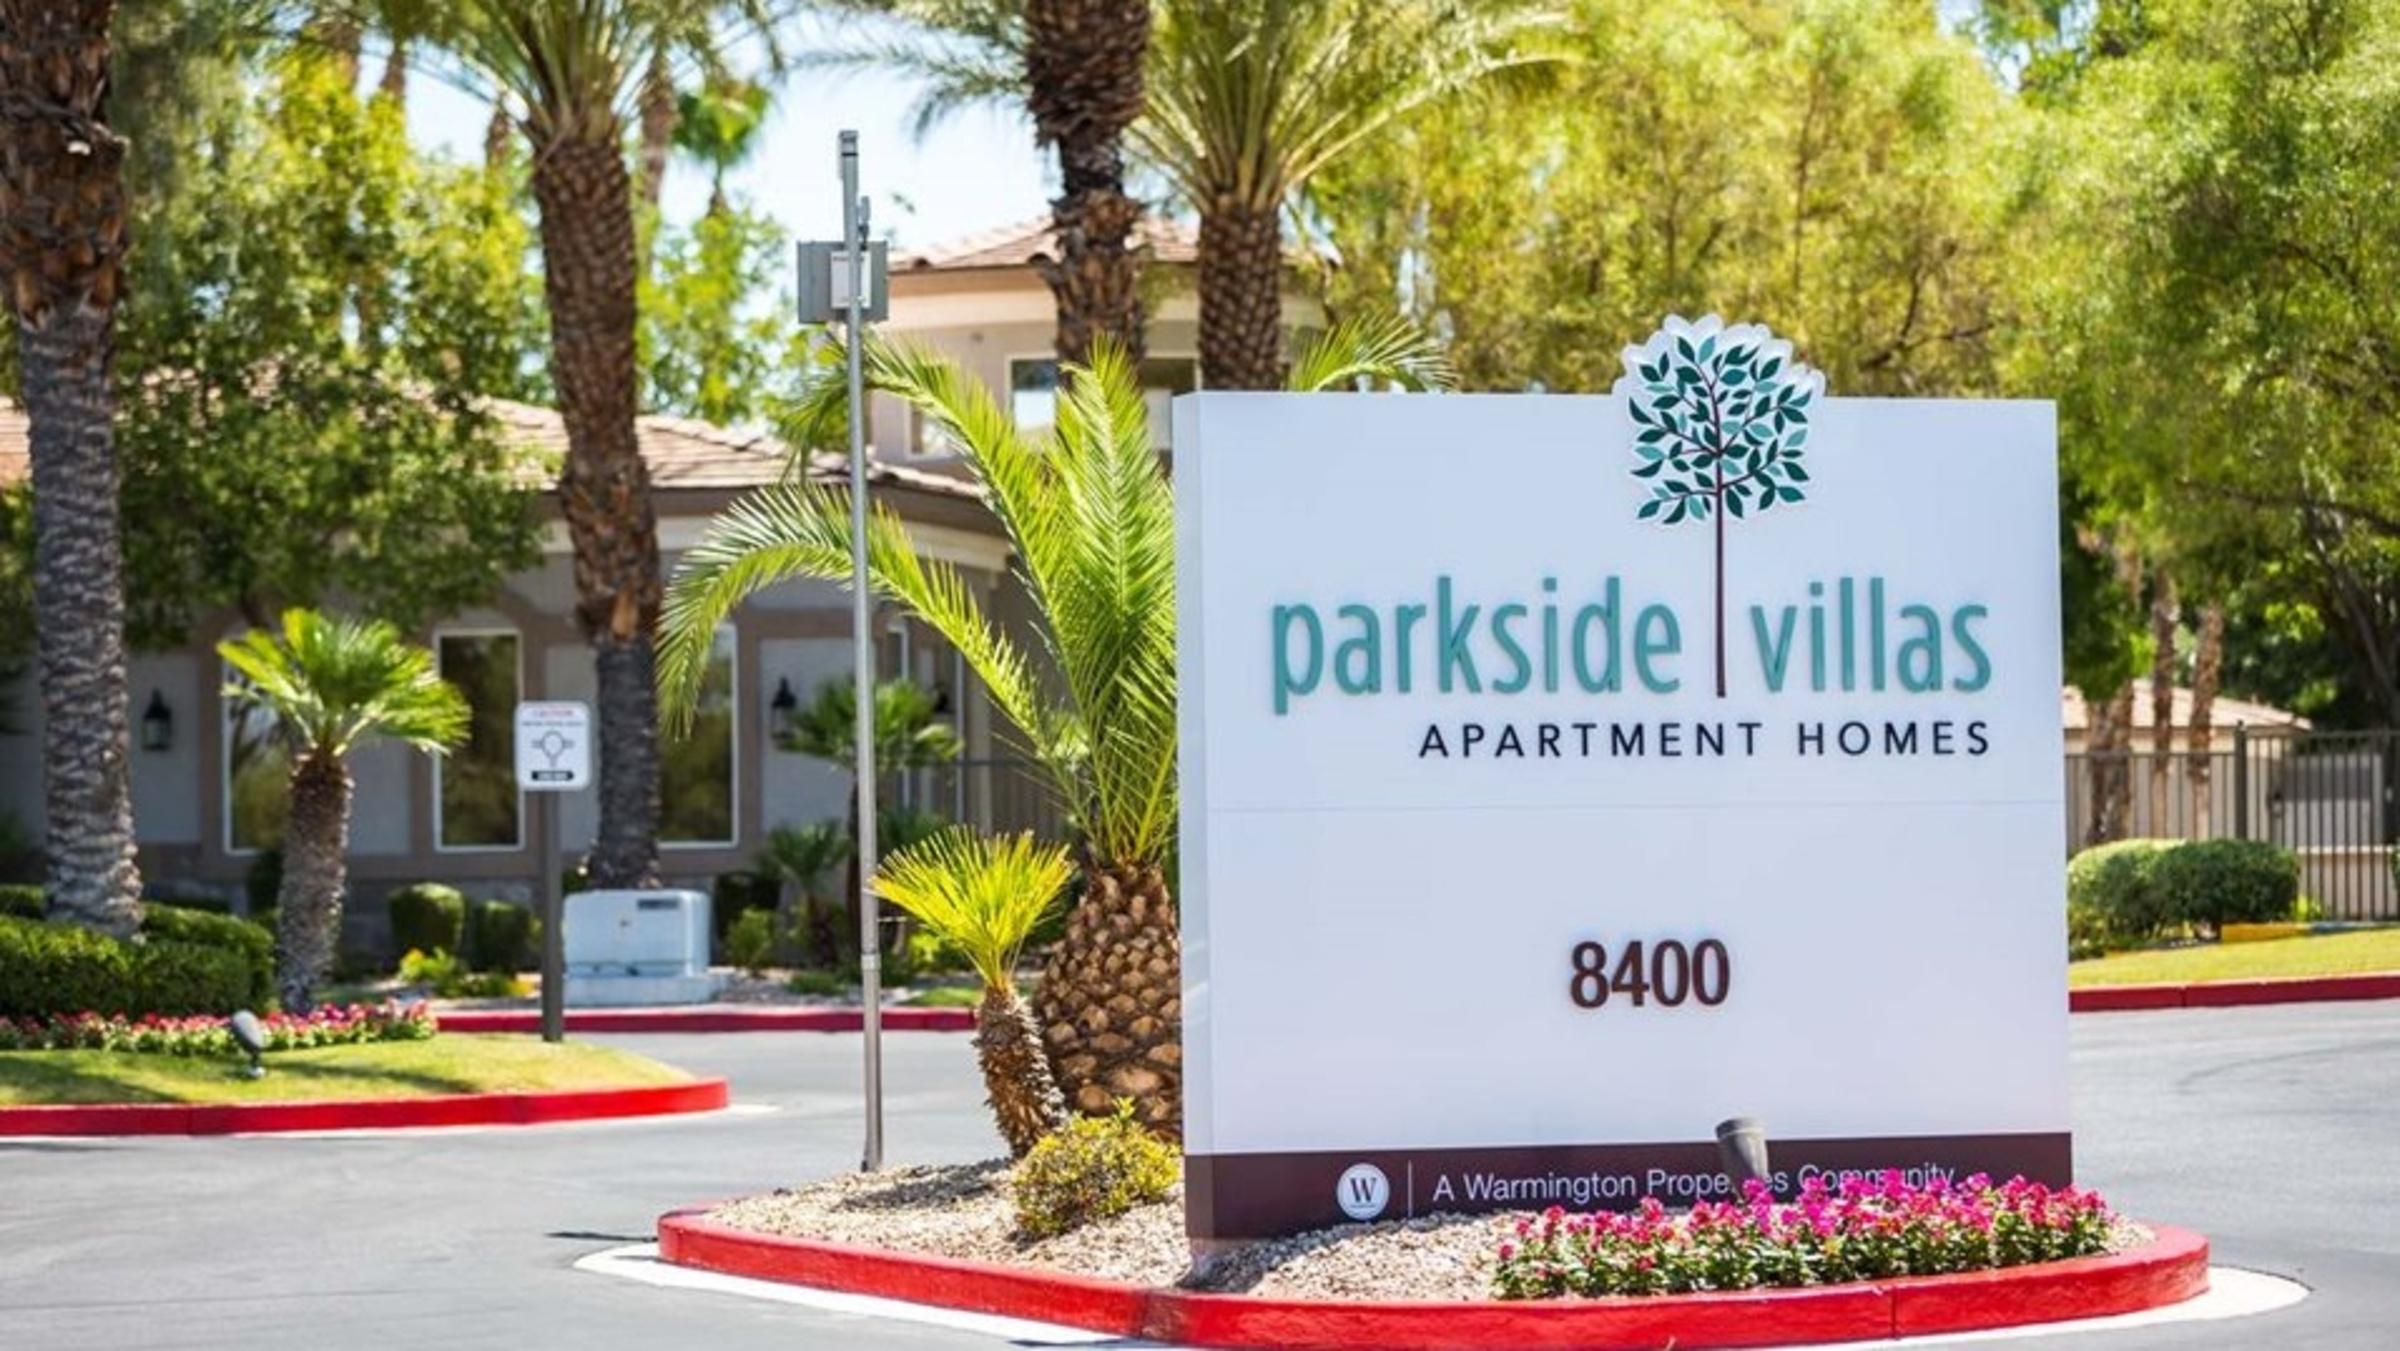 Parkside Villas